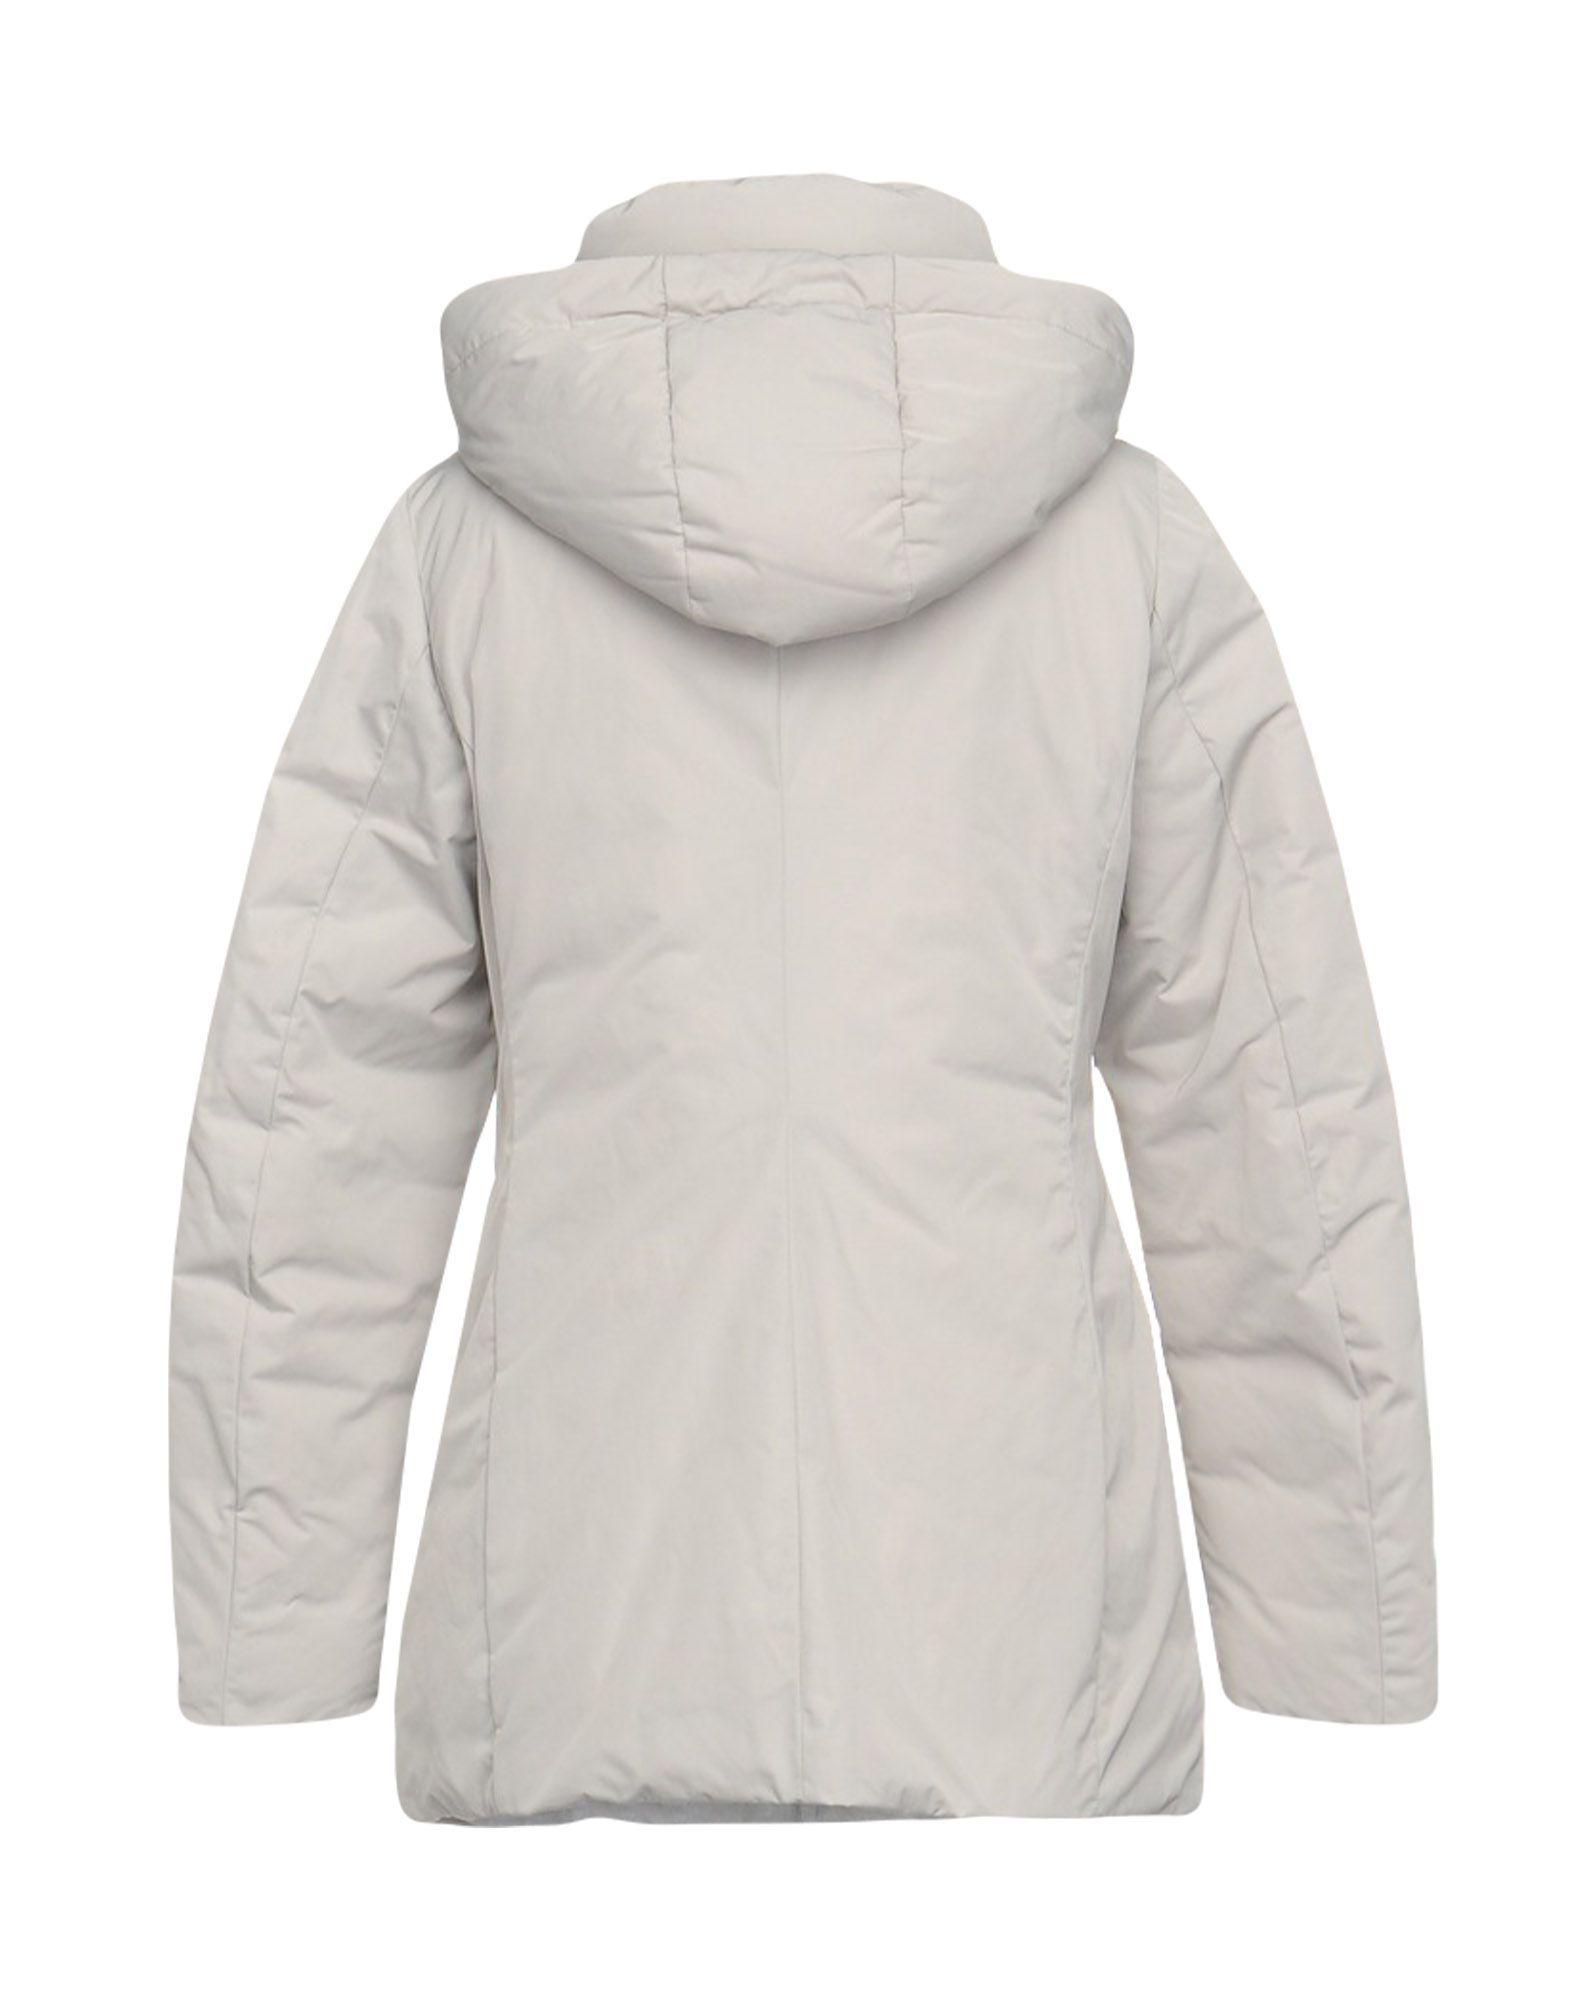 COATS & JACKETS [C] Studio Light grey Woman Polyester